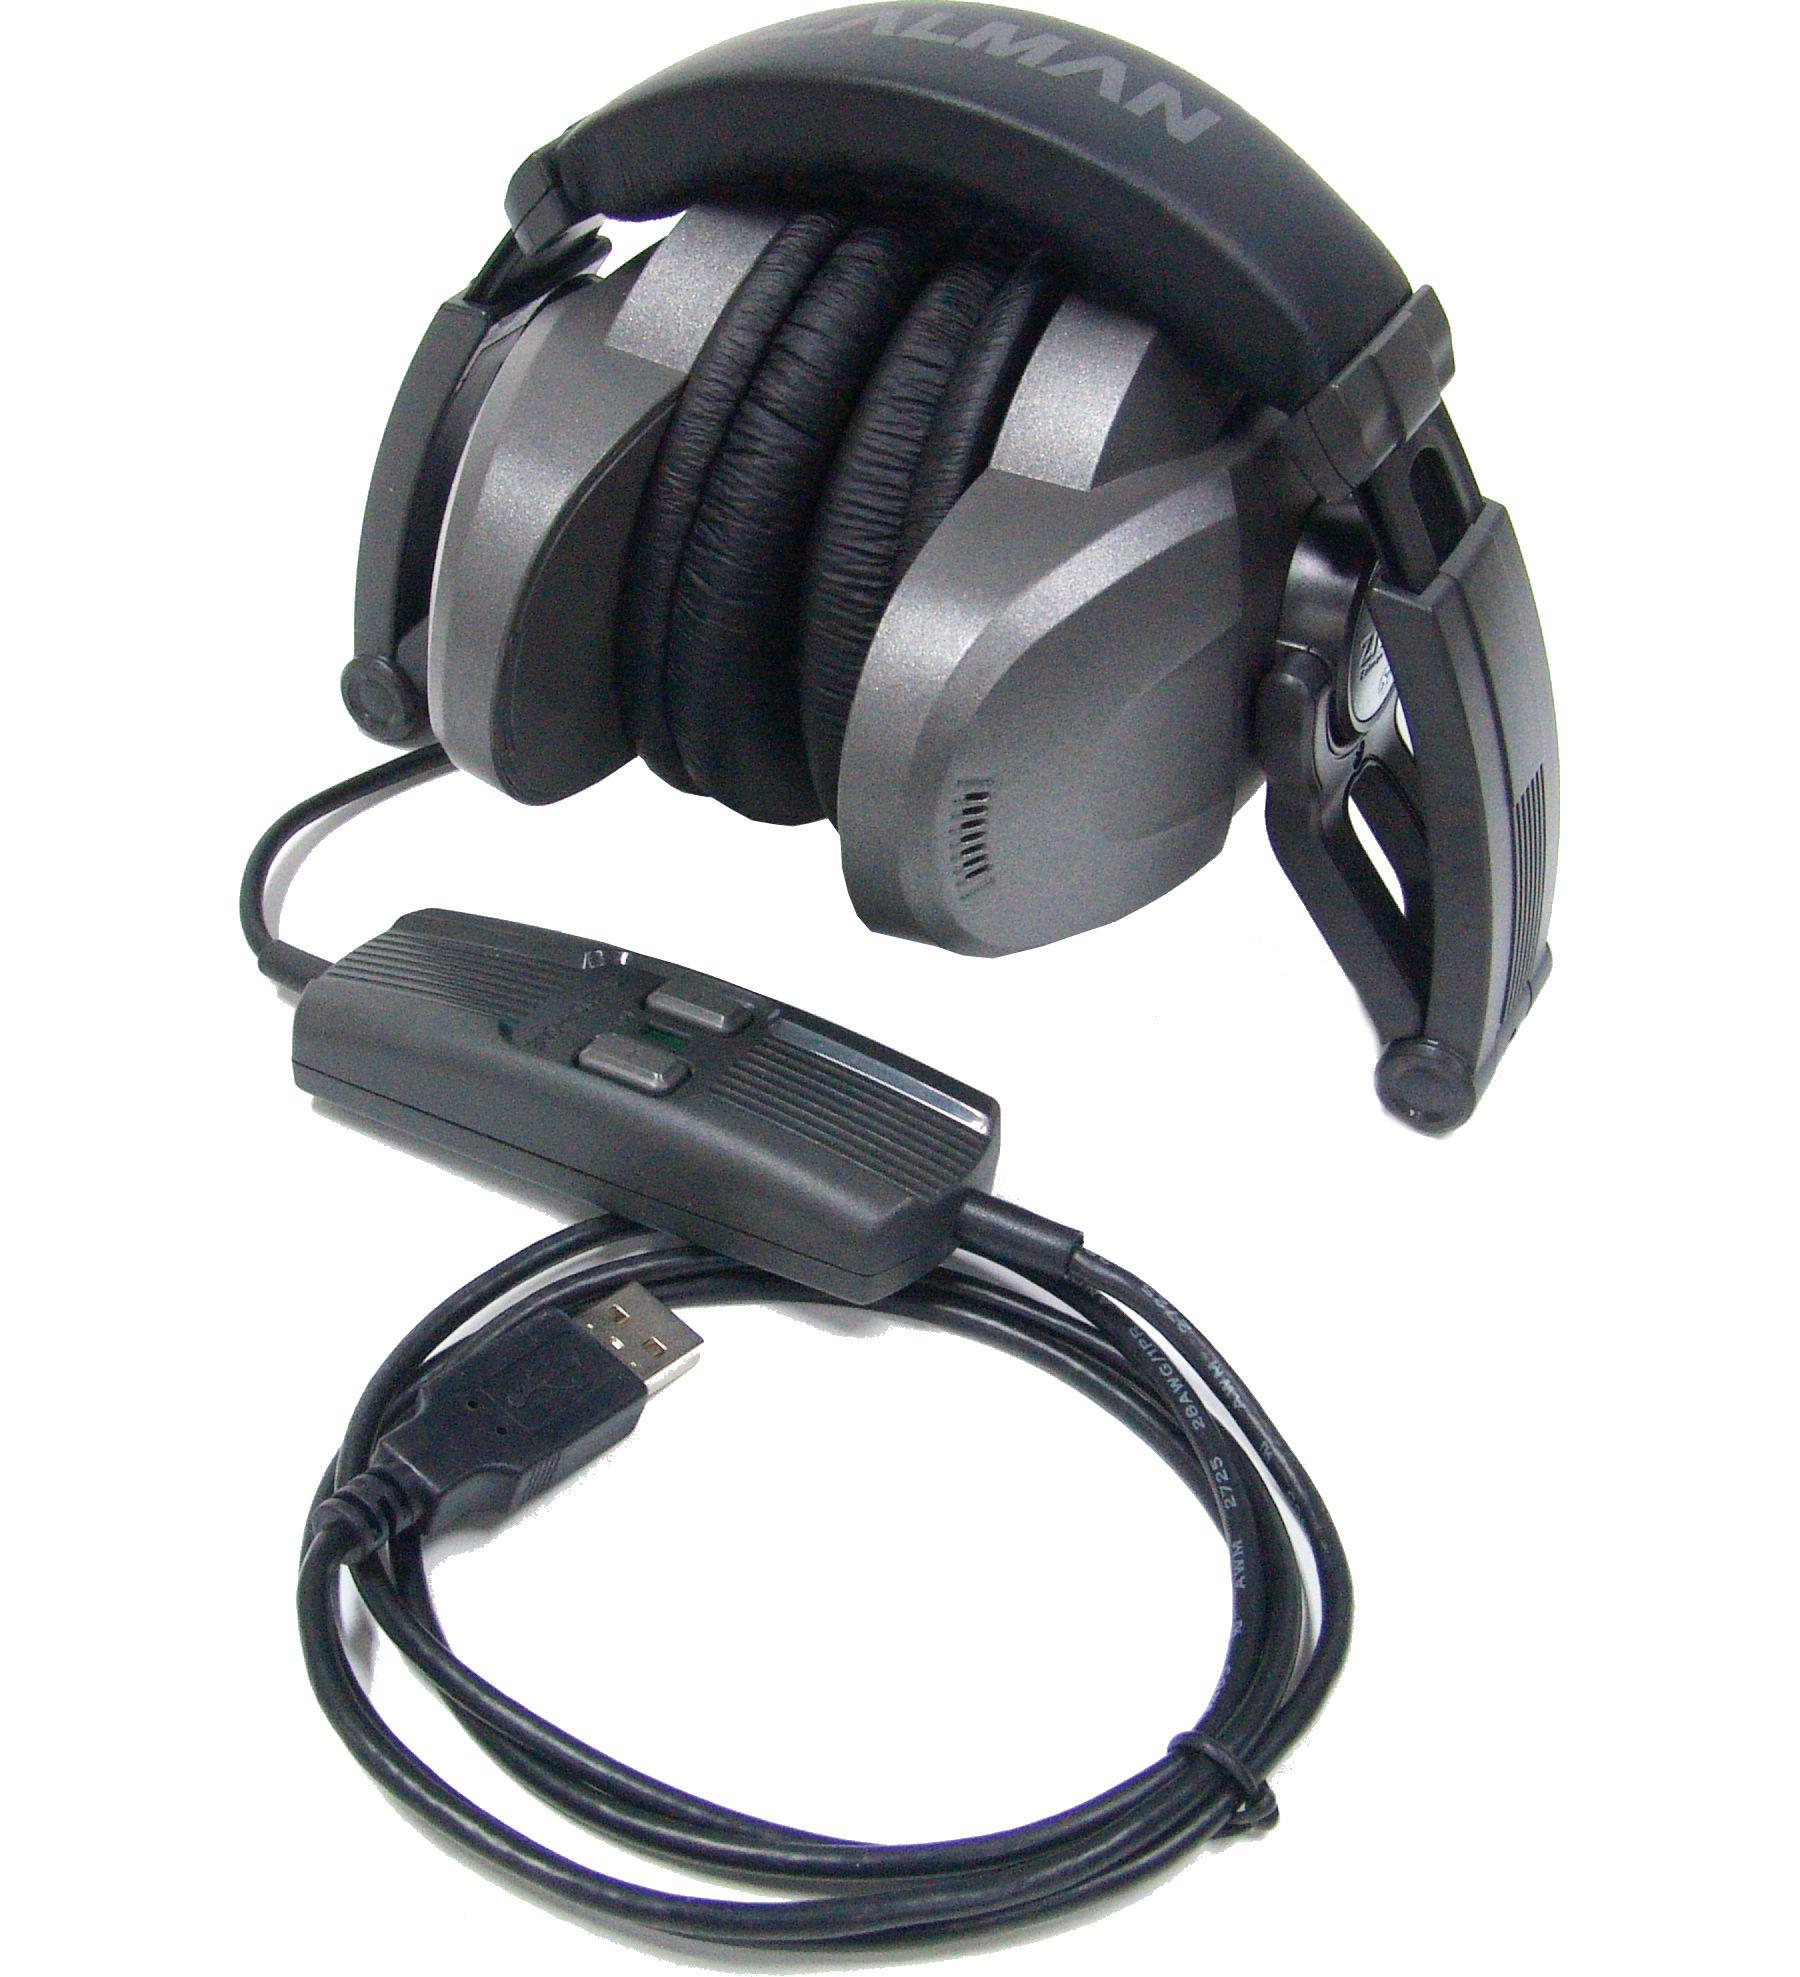 Cheapest Bluedio HT V4.1 Bluetooth Wireless Headphones,Stylish Heavy Bass Turbine Over-the-Ear